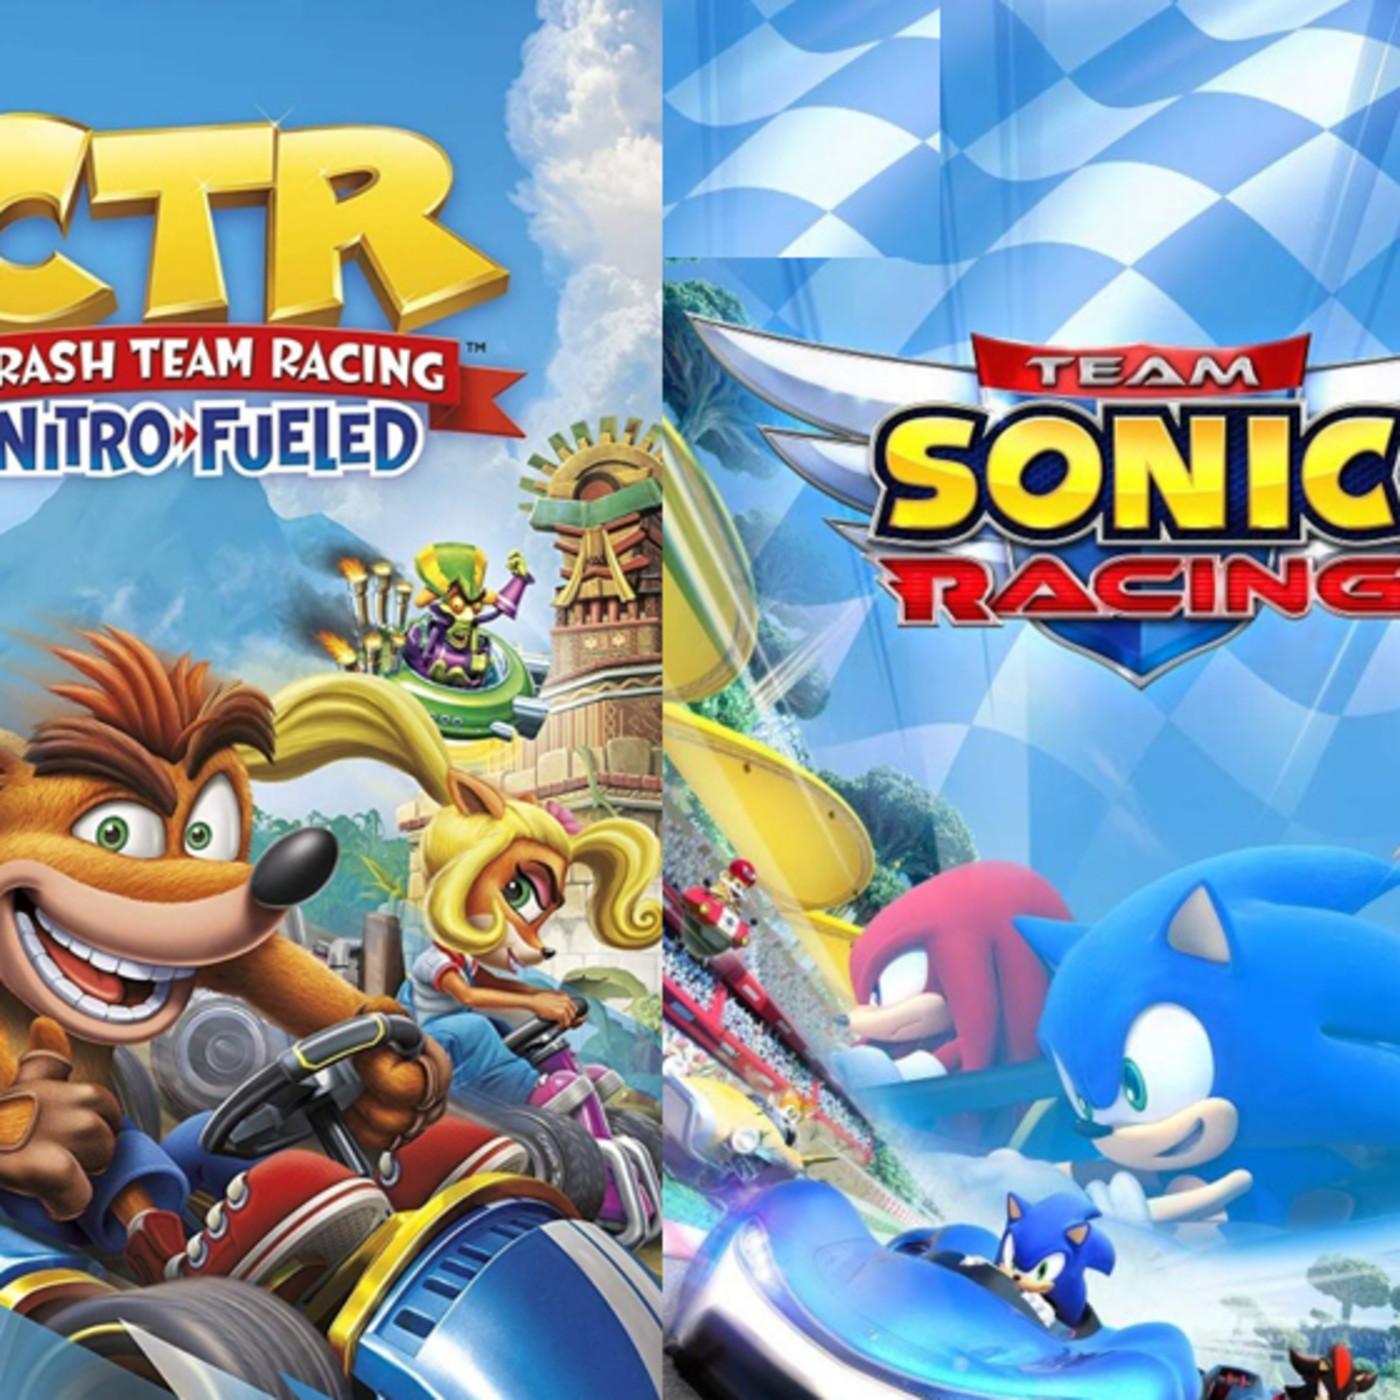 CG76-4 Team Sonic Racing - Crash Team Racing un Podcast de CronicasGoomba